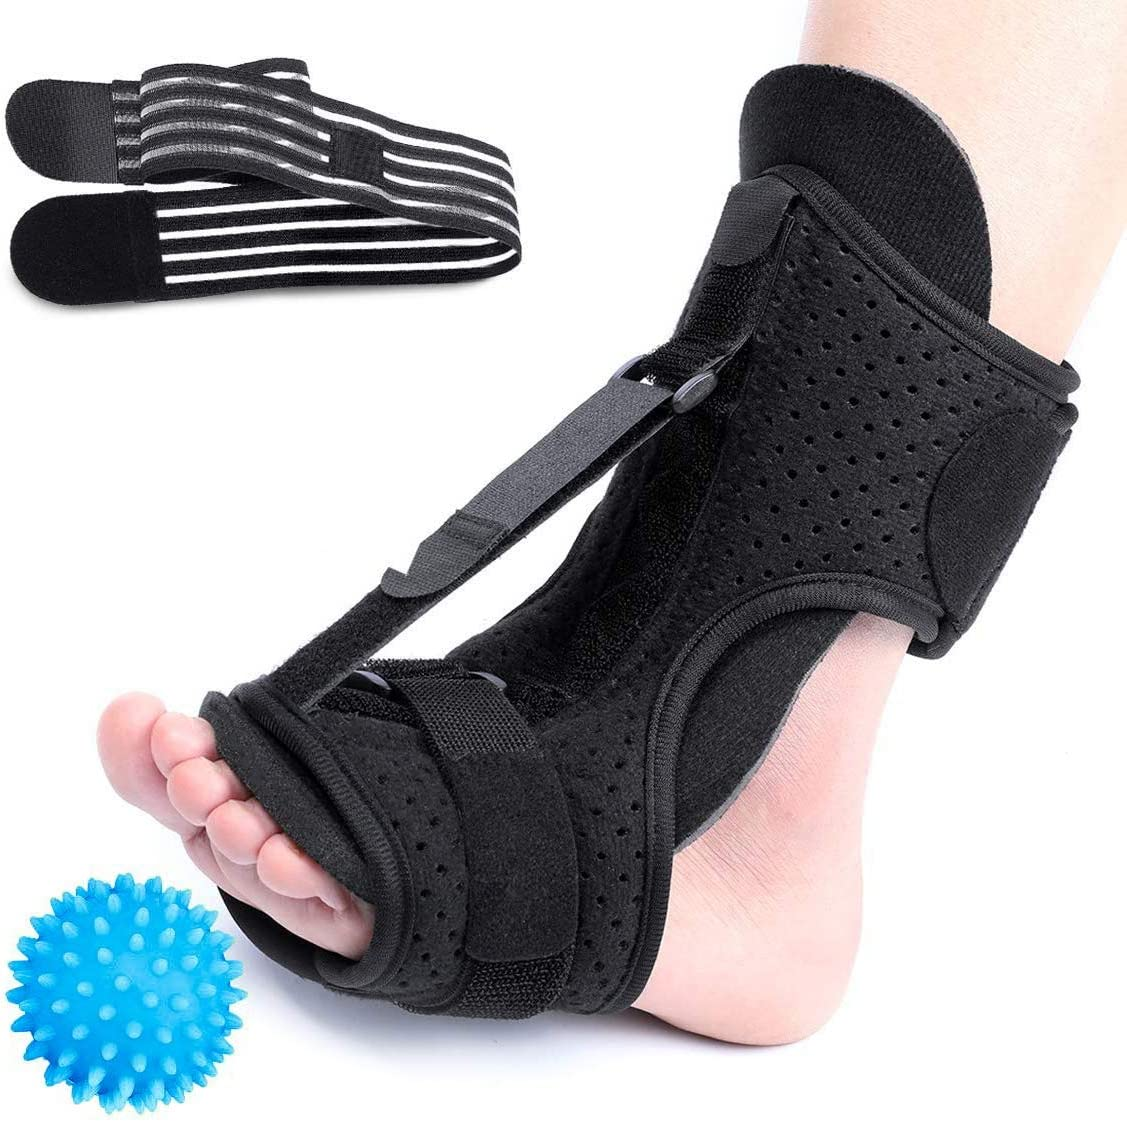 Arch Foot Pain Green Heel Brace for Drop Foot CHARMINER Plantar Fasciitis Night Splint Effective Relief from Plantar Fasciitis Pain Adjustable Plantar Fasciitis Brace